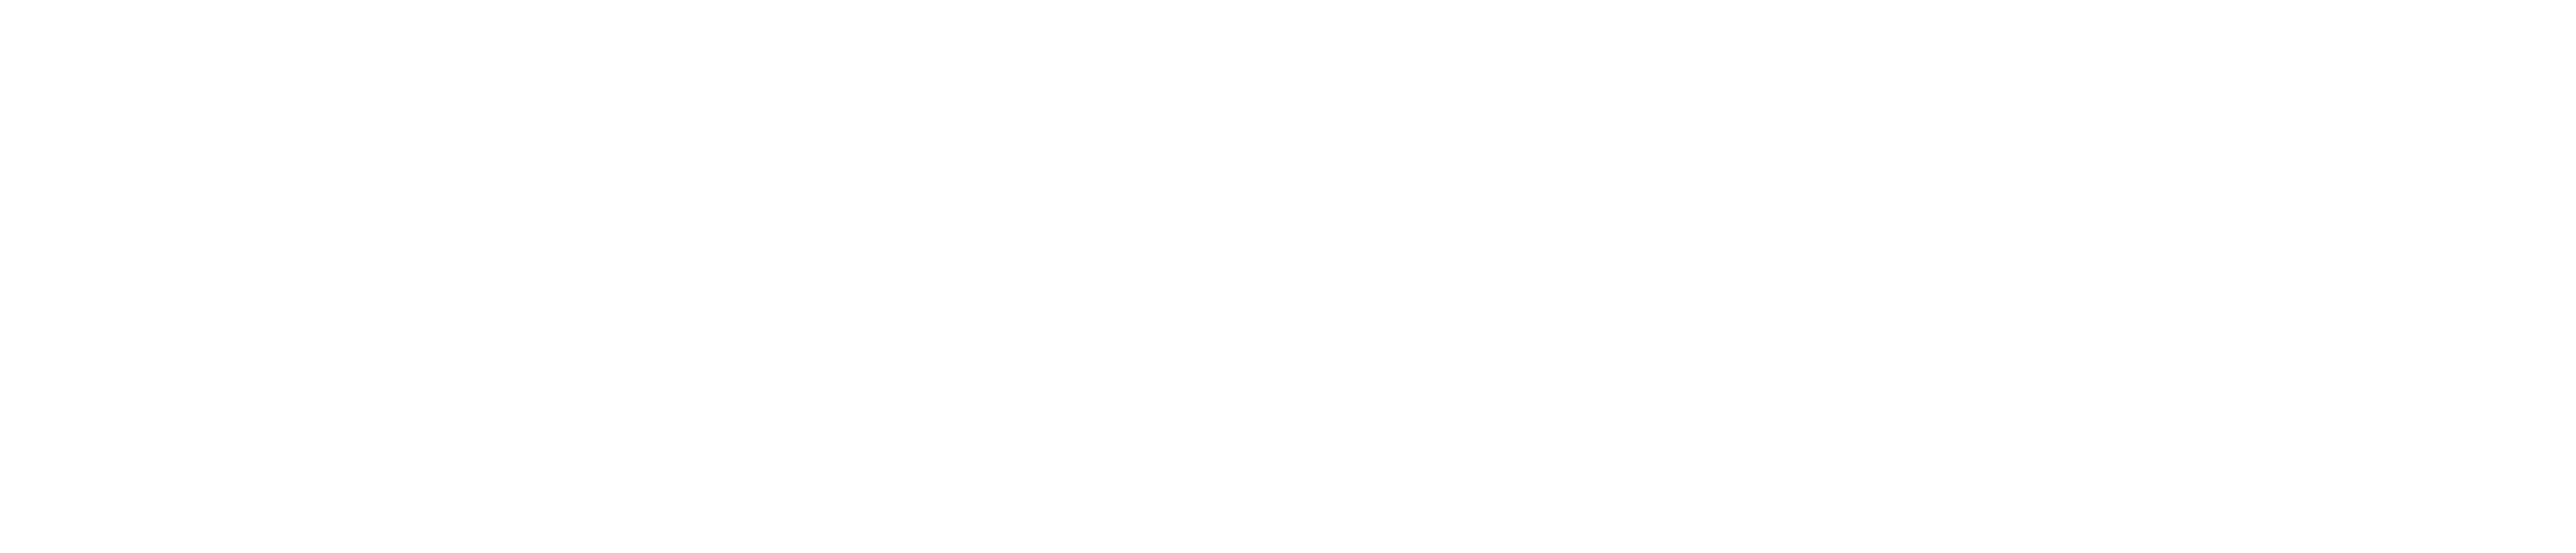 EA2030